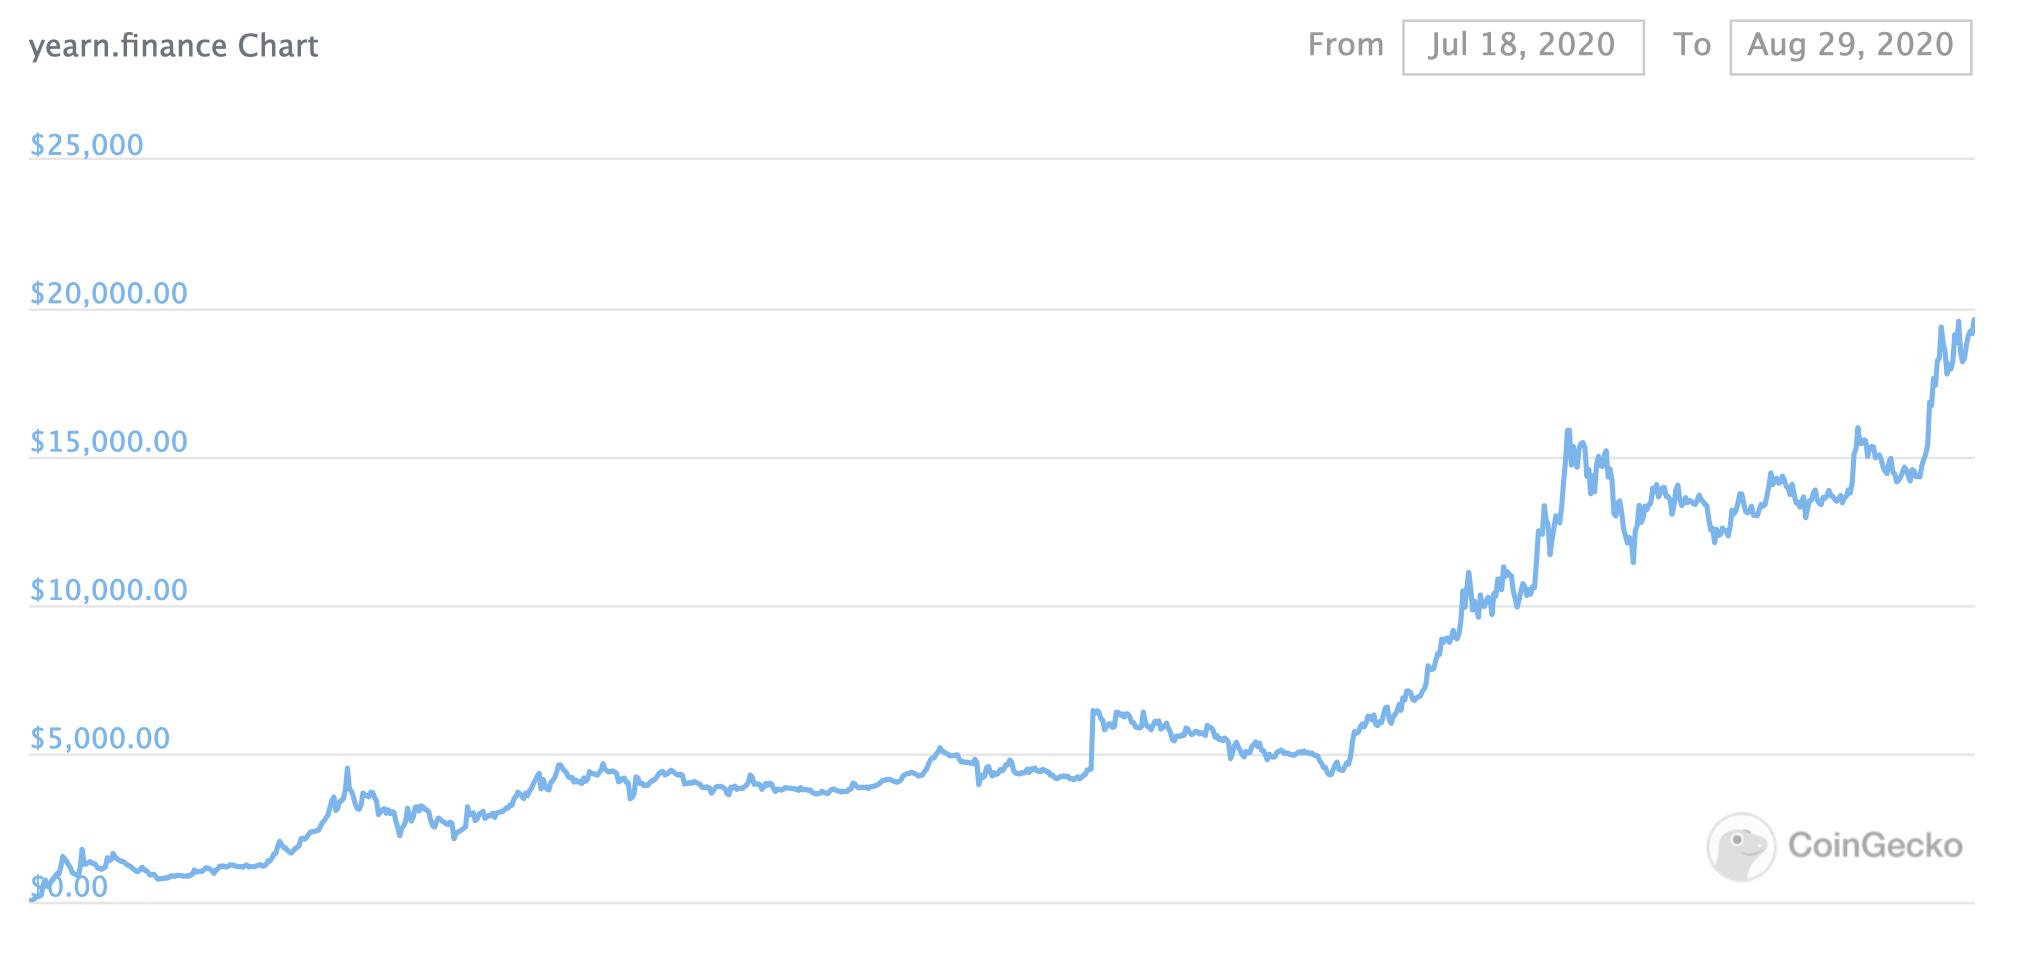 График курса YFI